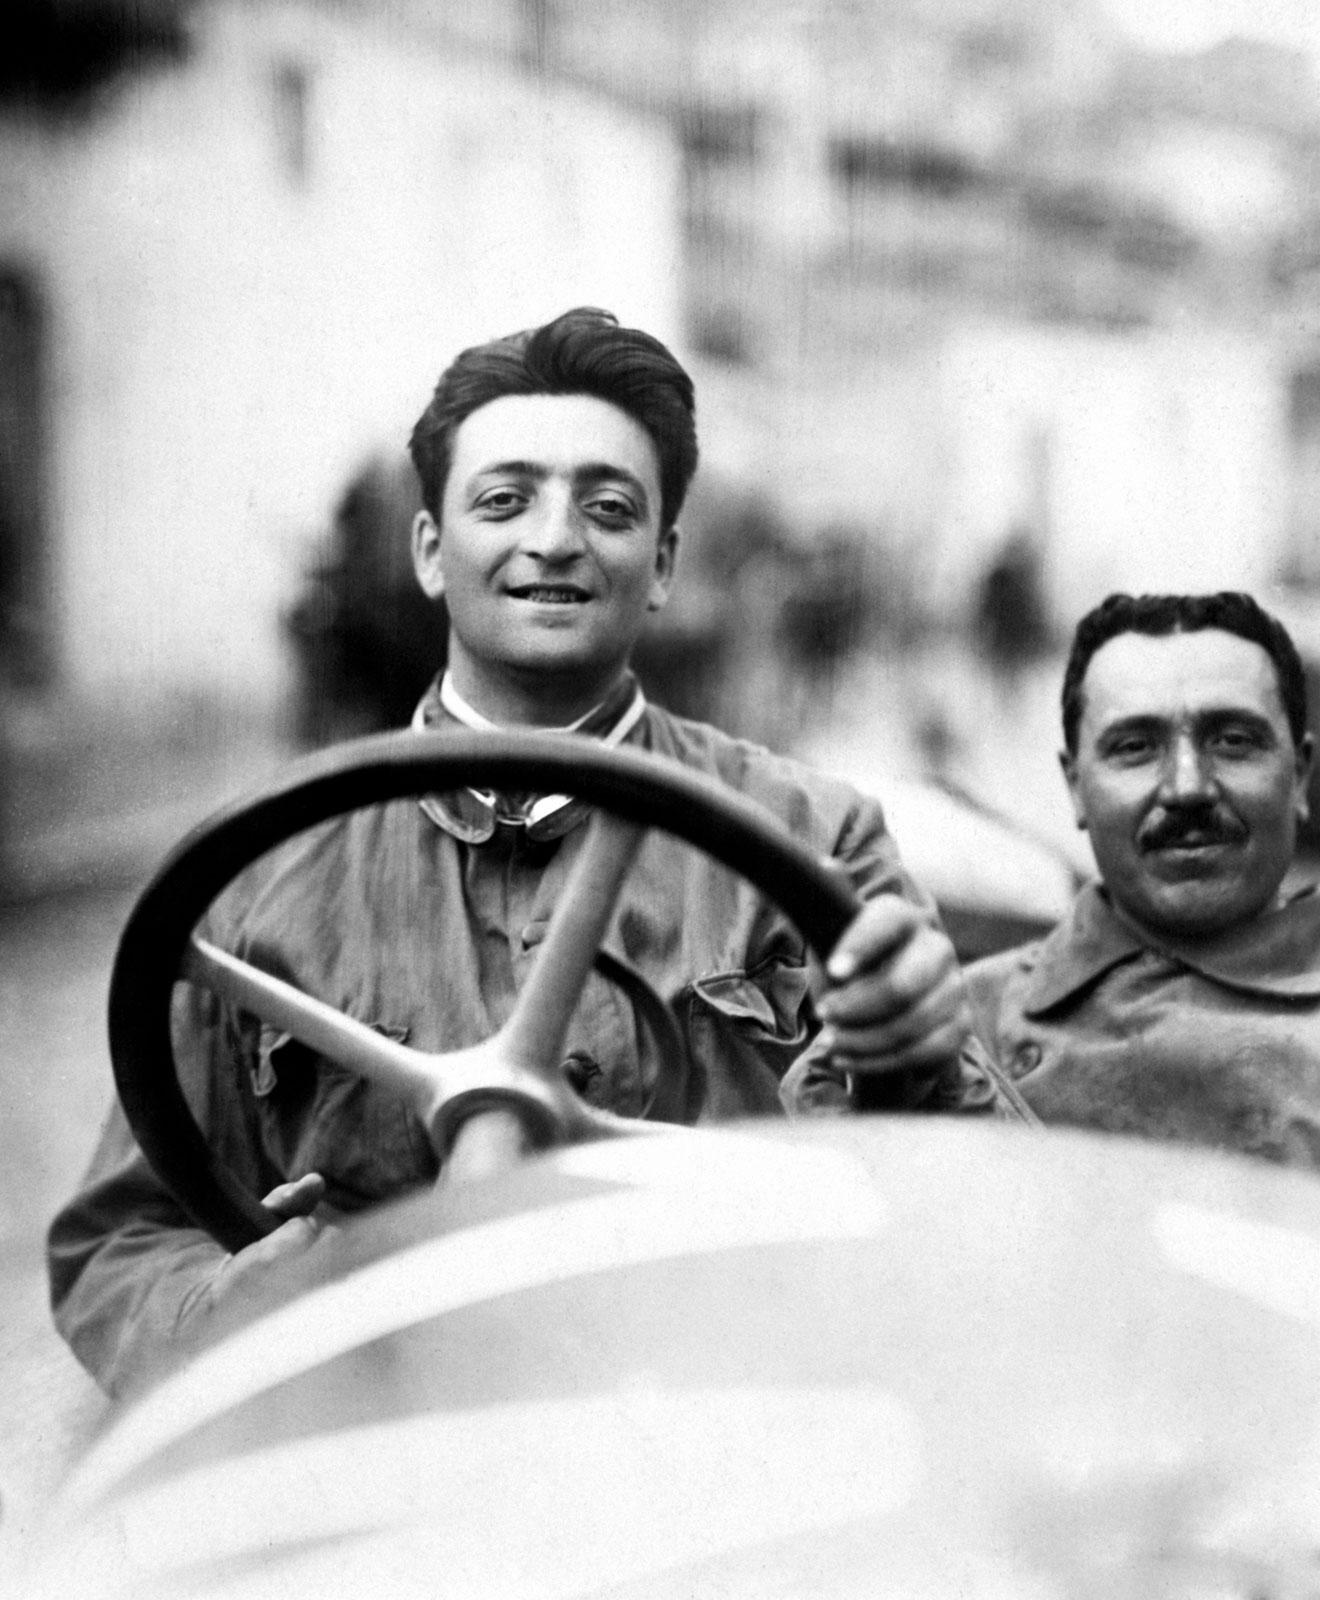 Enzo Ferrari At The Targa Florio In 1920 The Car Is An Alfa Romeo 40 60 Hp Racing Type Car Body Design